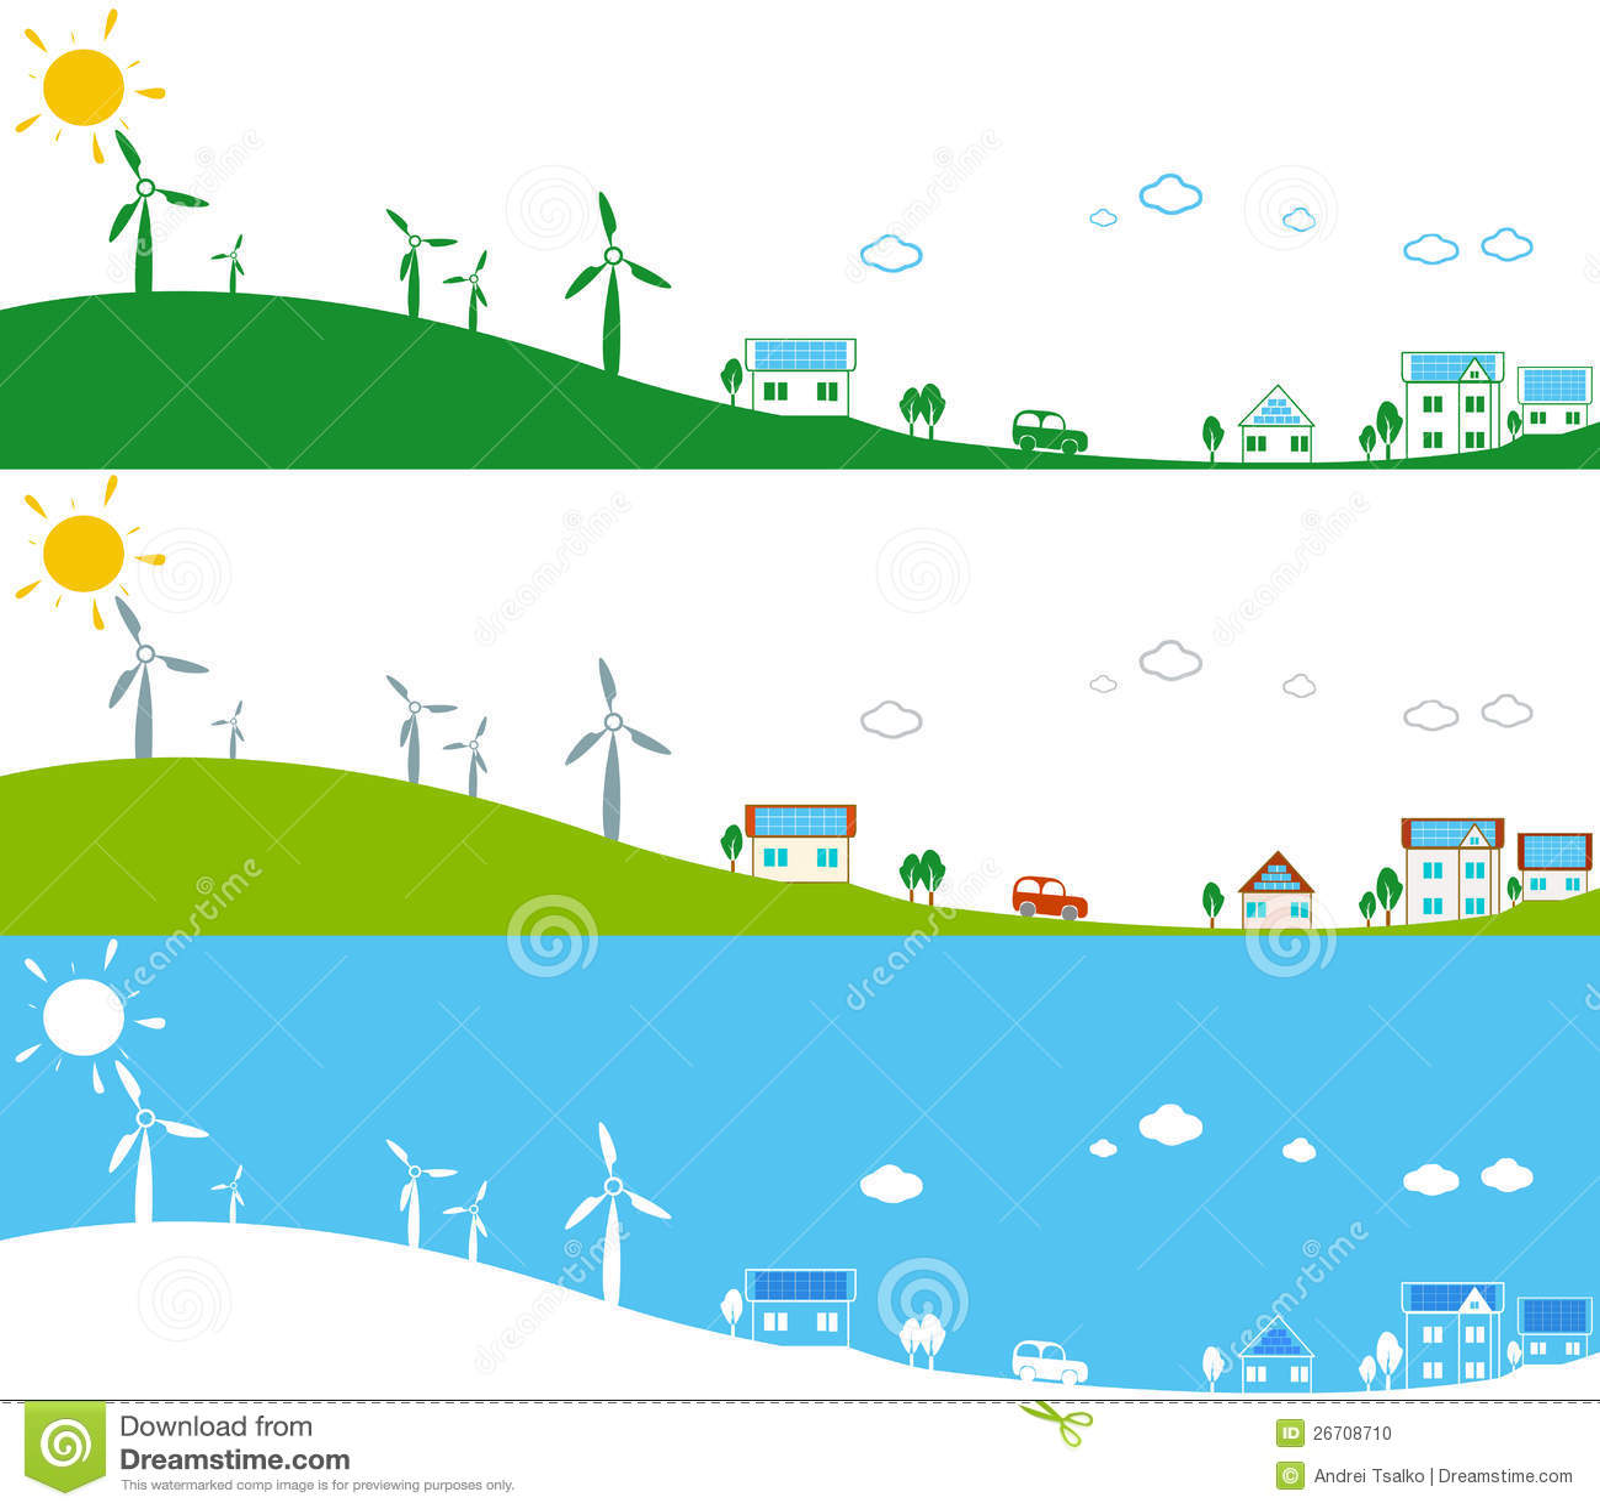 worksheet Alternative Energy Sources alternative energy sources stock photo image 26708710 sources